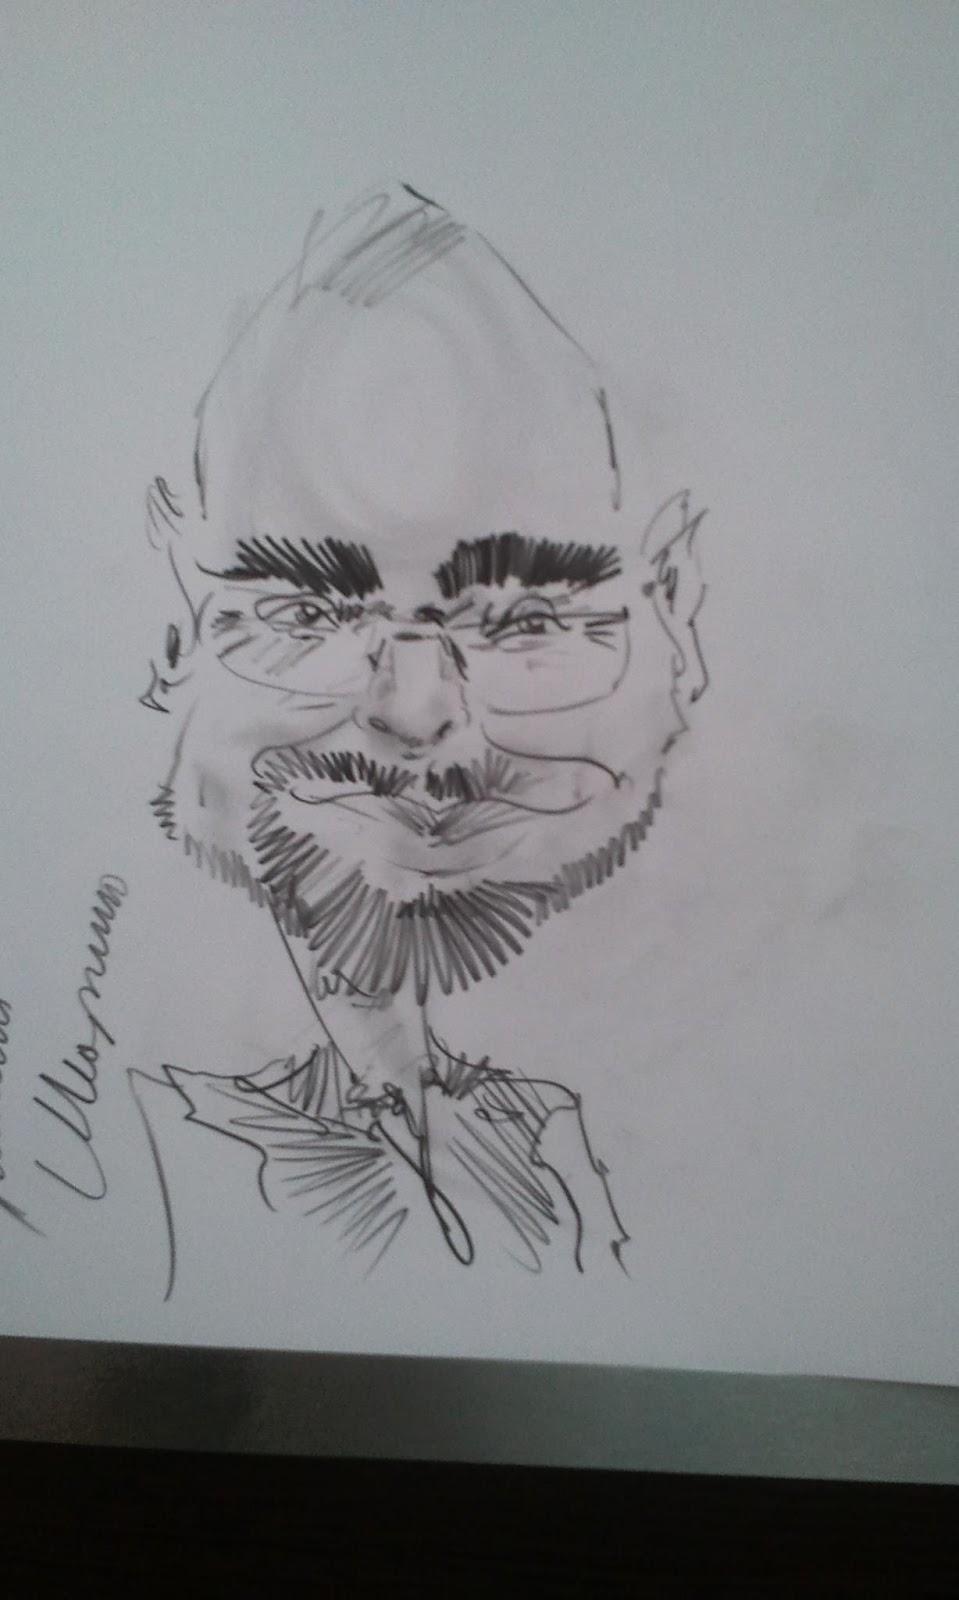 Портрет Володи Пронина. Характер схвачен очень точно ;)